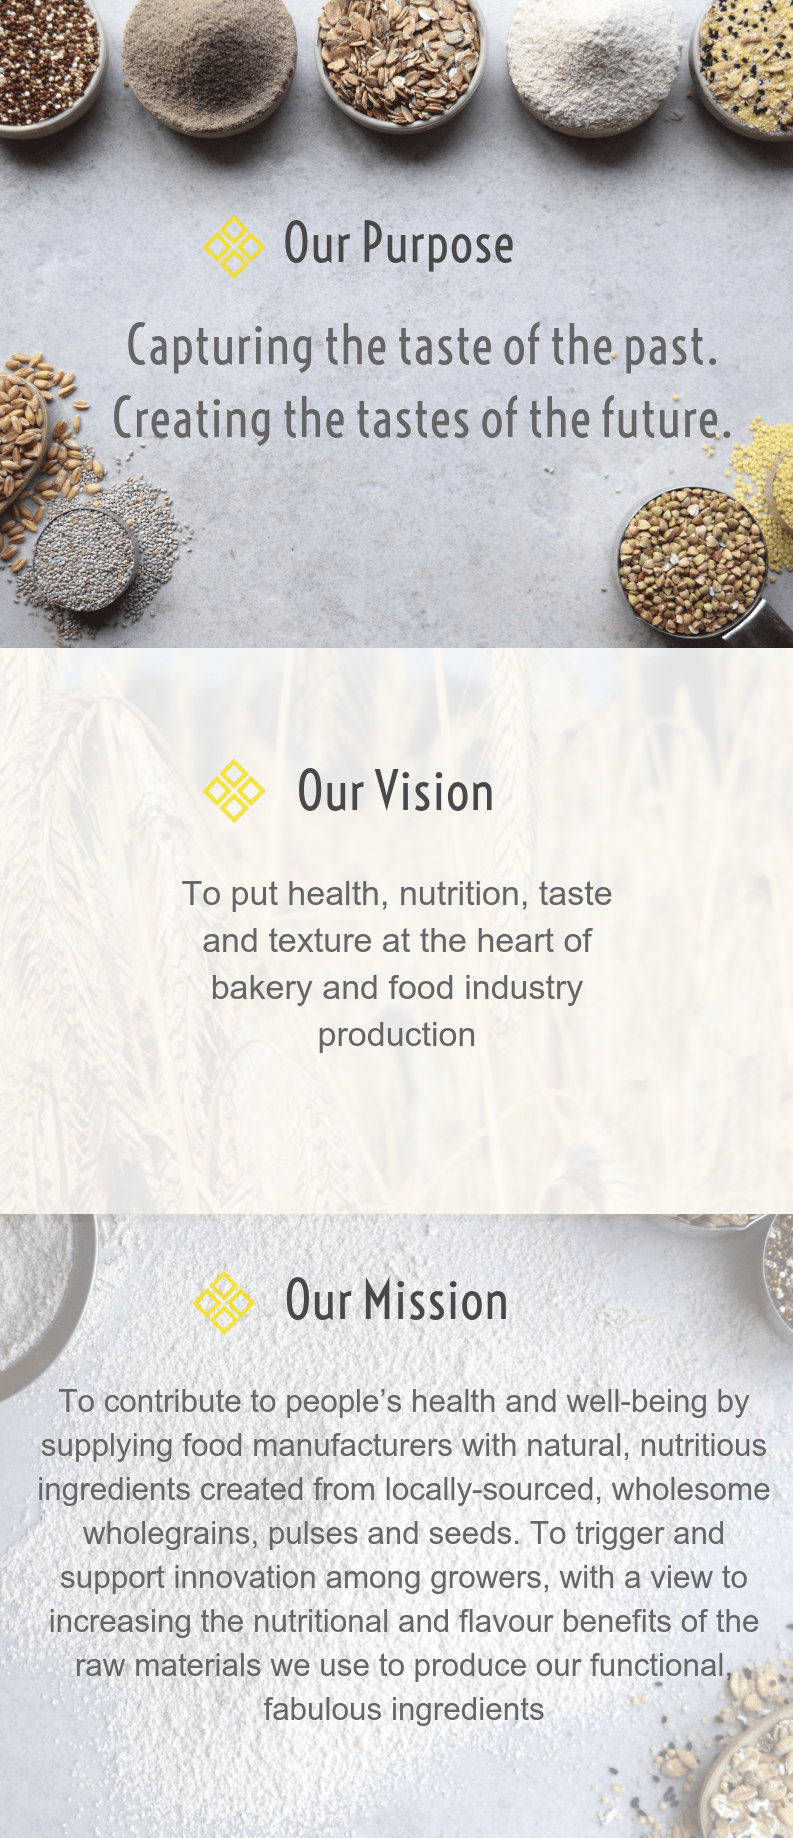 EDME - Values - Introduction, Vision, Mission, Purpose